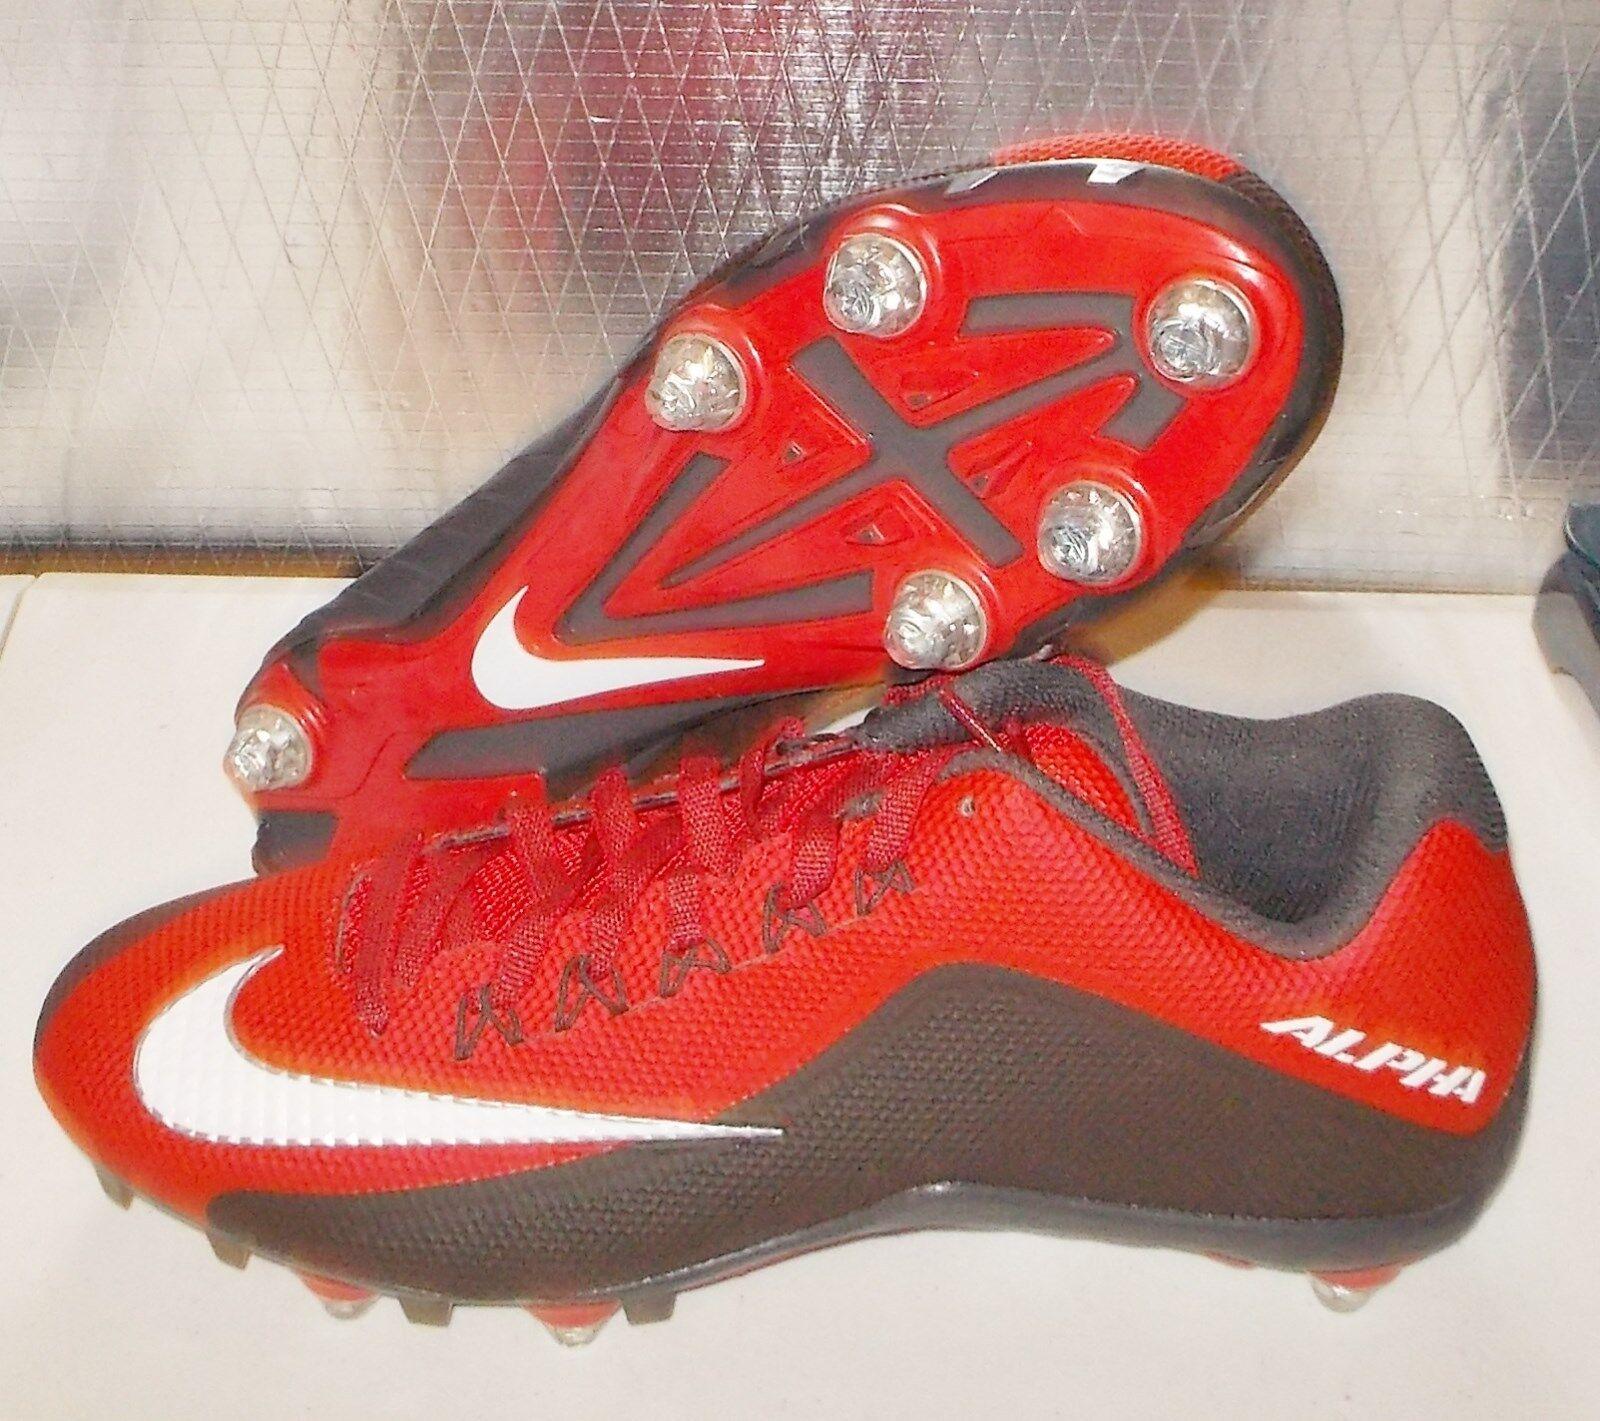 NIKE ALPHA PRO 2 D PF Detachable Football Cleats NikeSkin MENS 742767 630 NEW